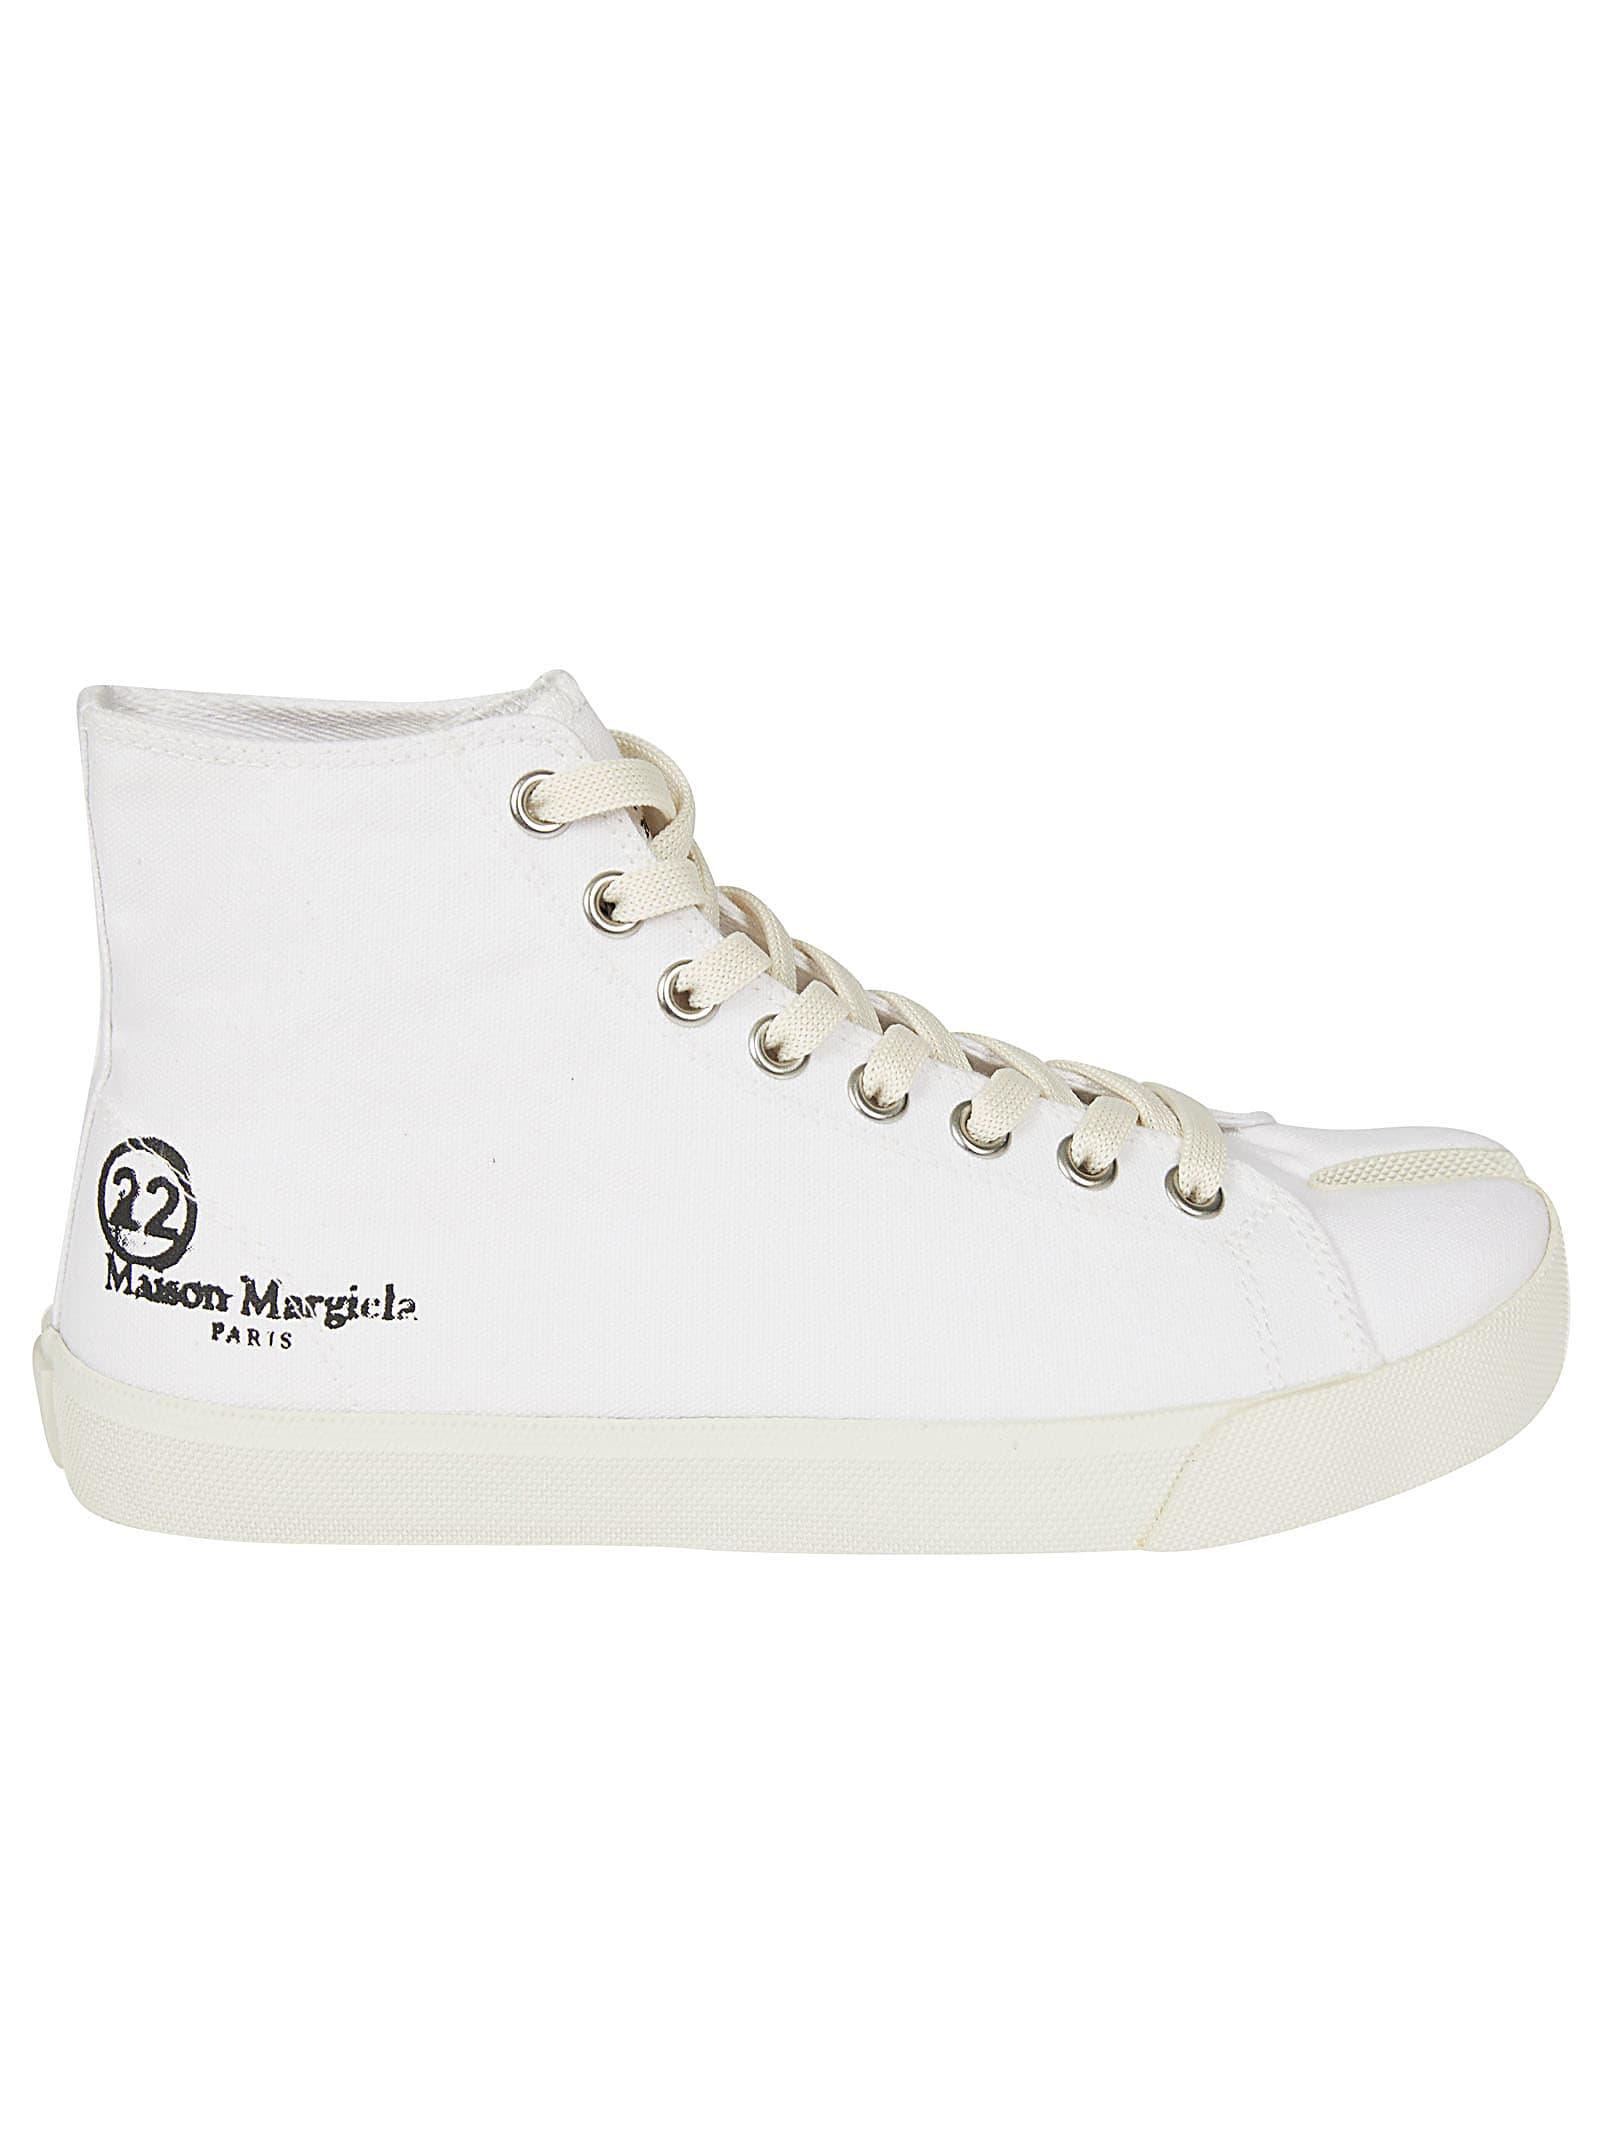 Buy Maison Margiela Logo Print Hi-top Sneakers online, shop Maison Margiela shoes with free shipping